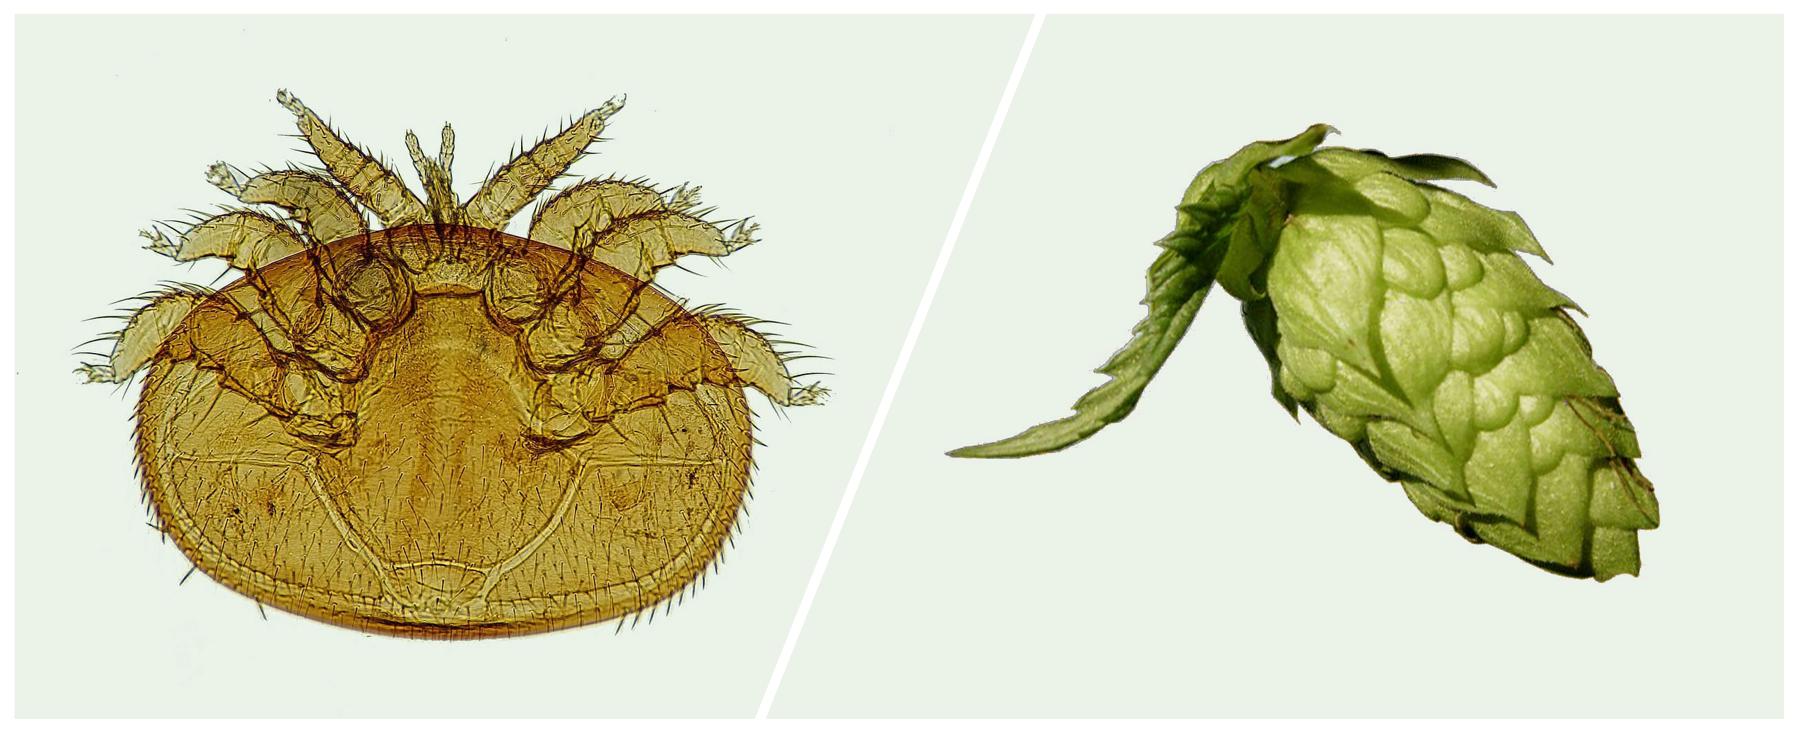 Left, a varroa mite. Right, a hop flower.